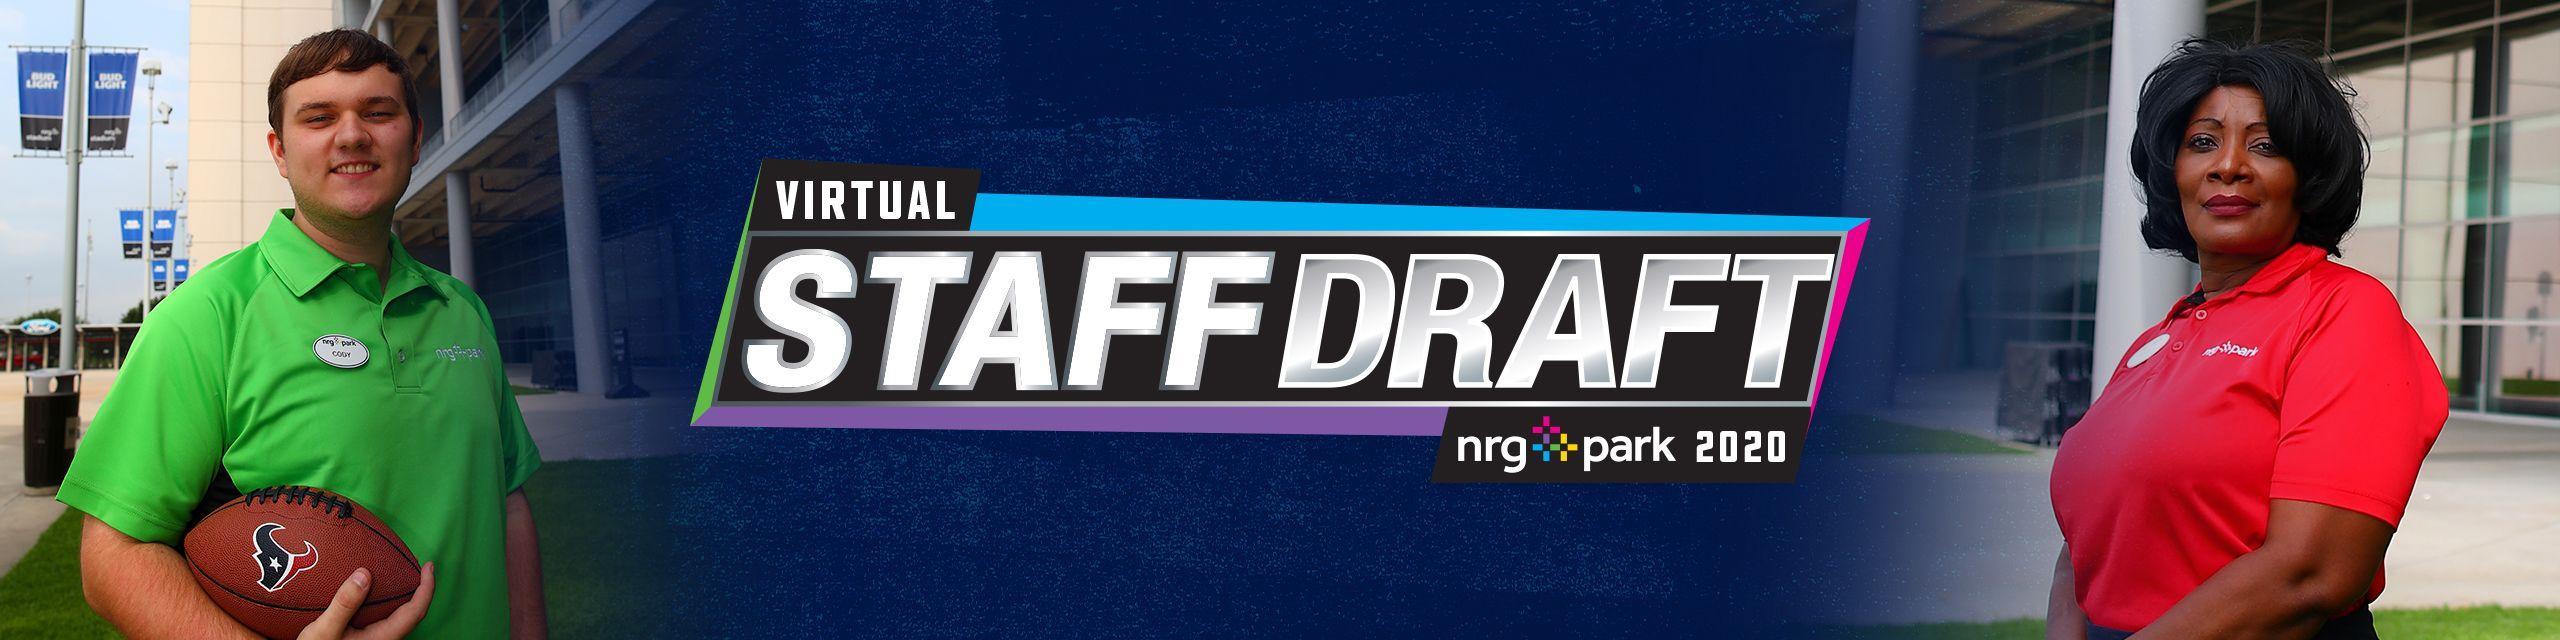 Virtual Staff Draft. NRG Park 2020